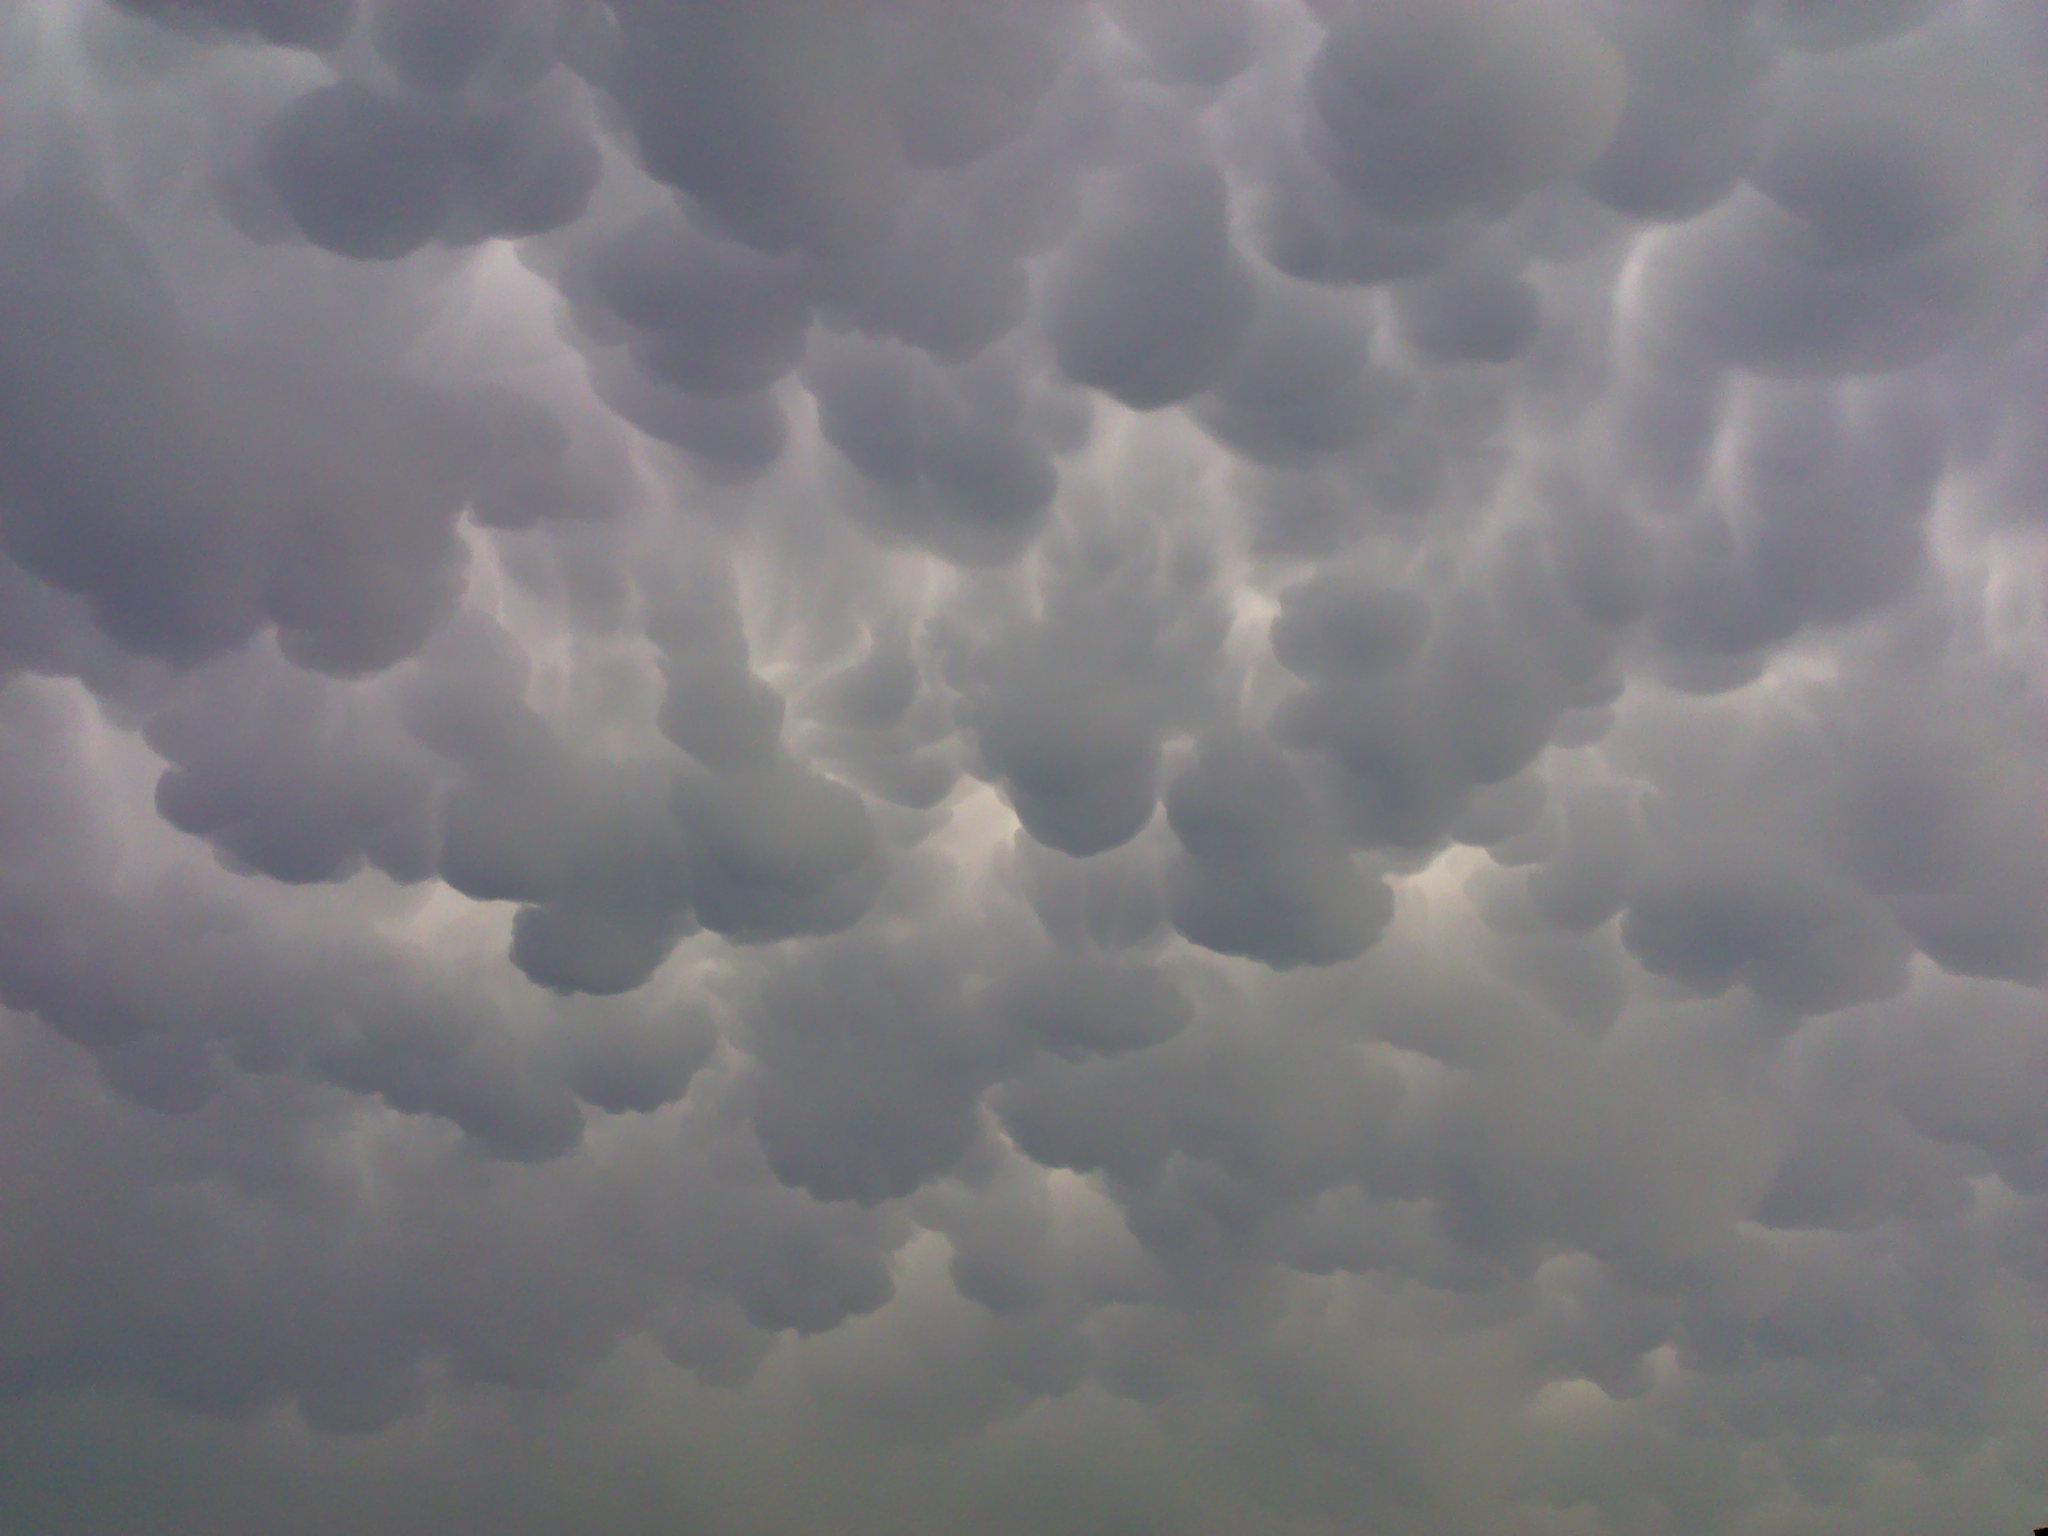 Joplin >> File:5-22-11 at 506 pm approx 40 minutes prior to the tornado that devastated Joplin,mo.jpg ...